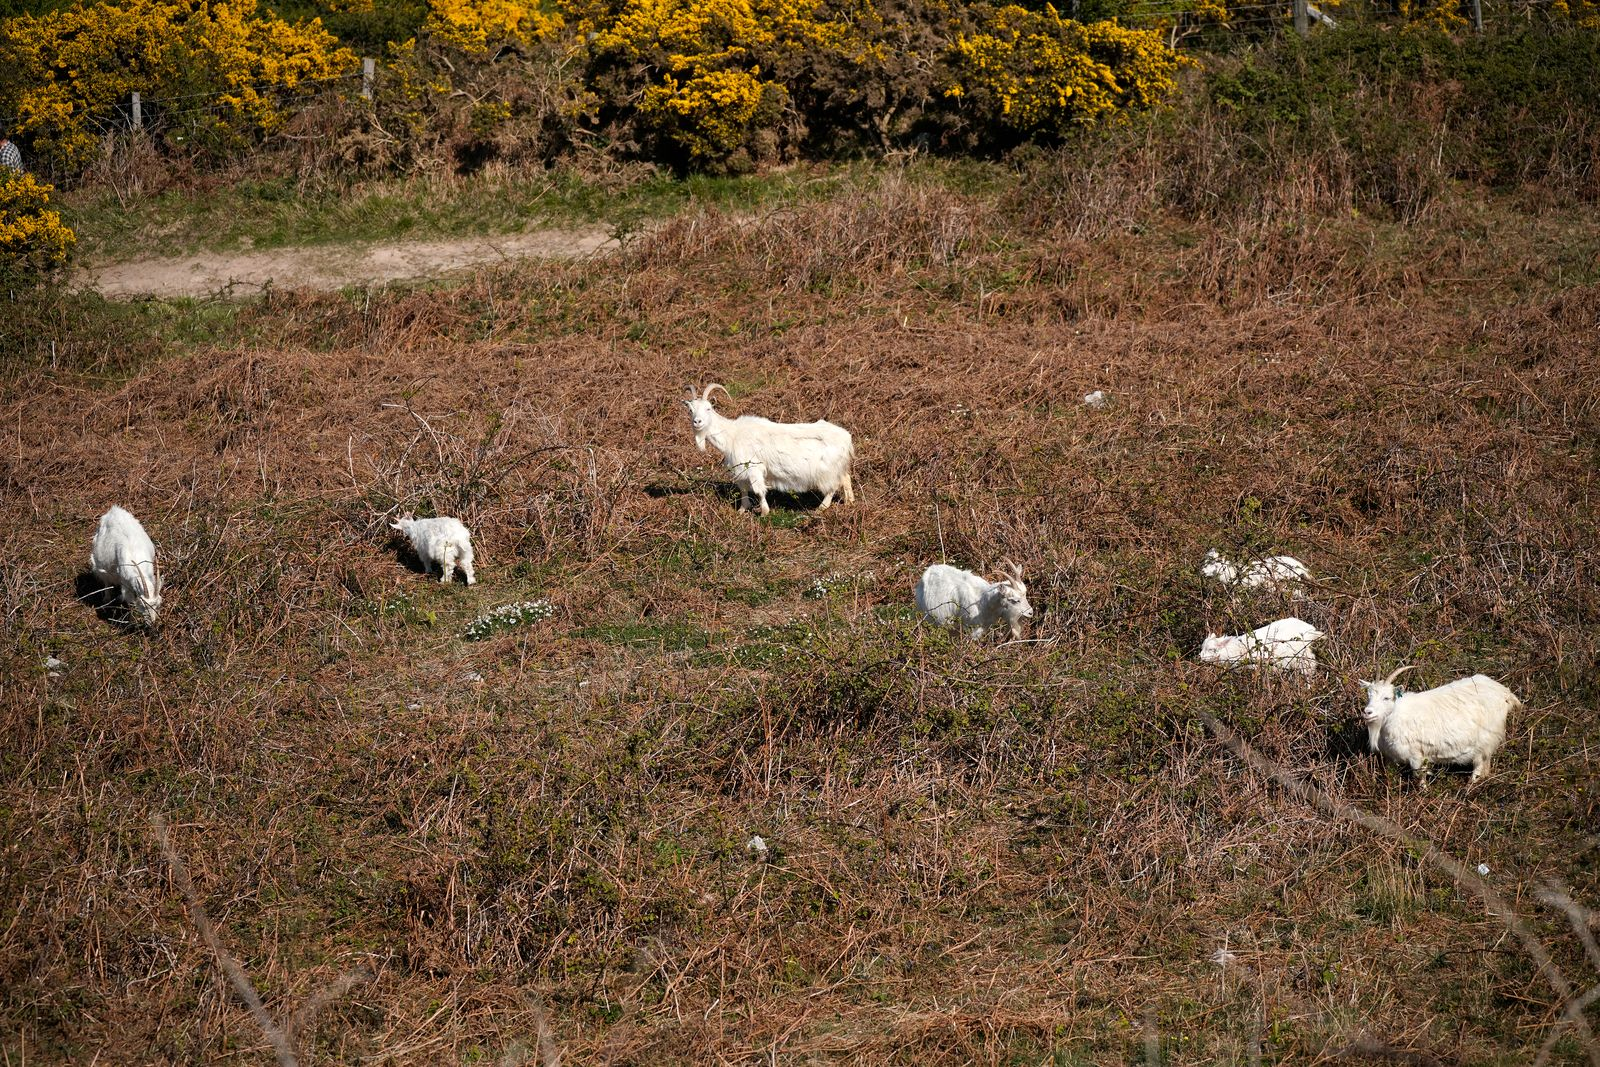 Llandudno Goats Return To Headland Home After Roaming Town On Lockdown